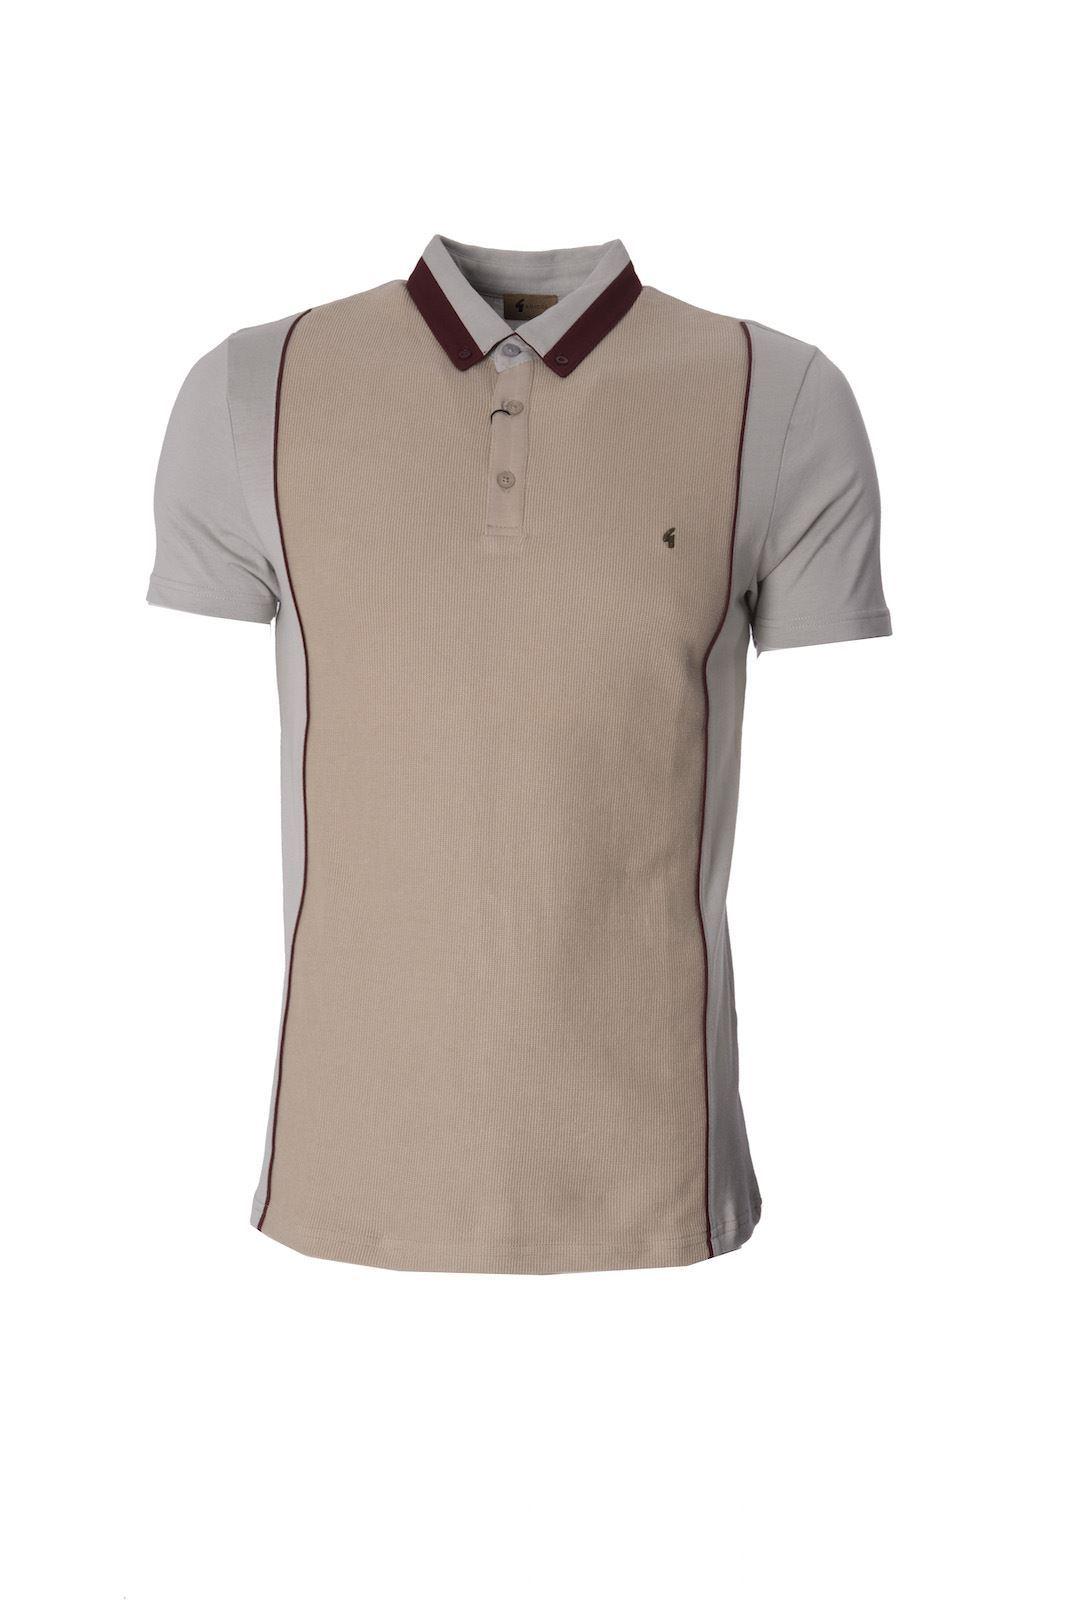 Gabicci Designer Mens Polo Shirt Button Down Collar Short